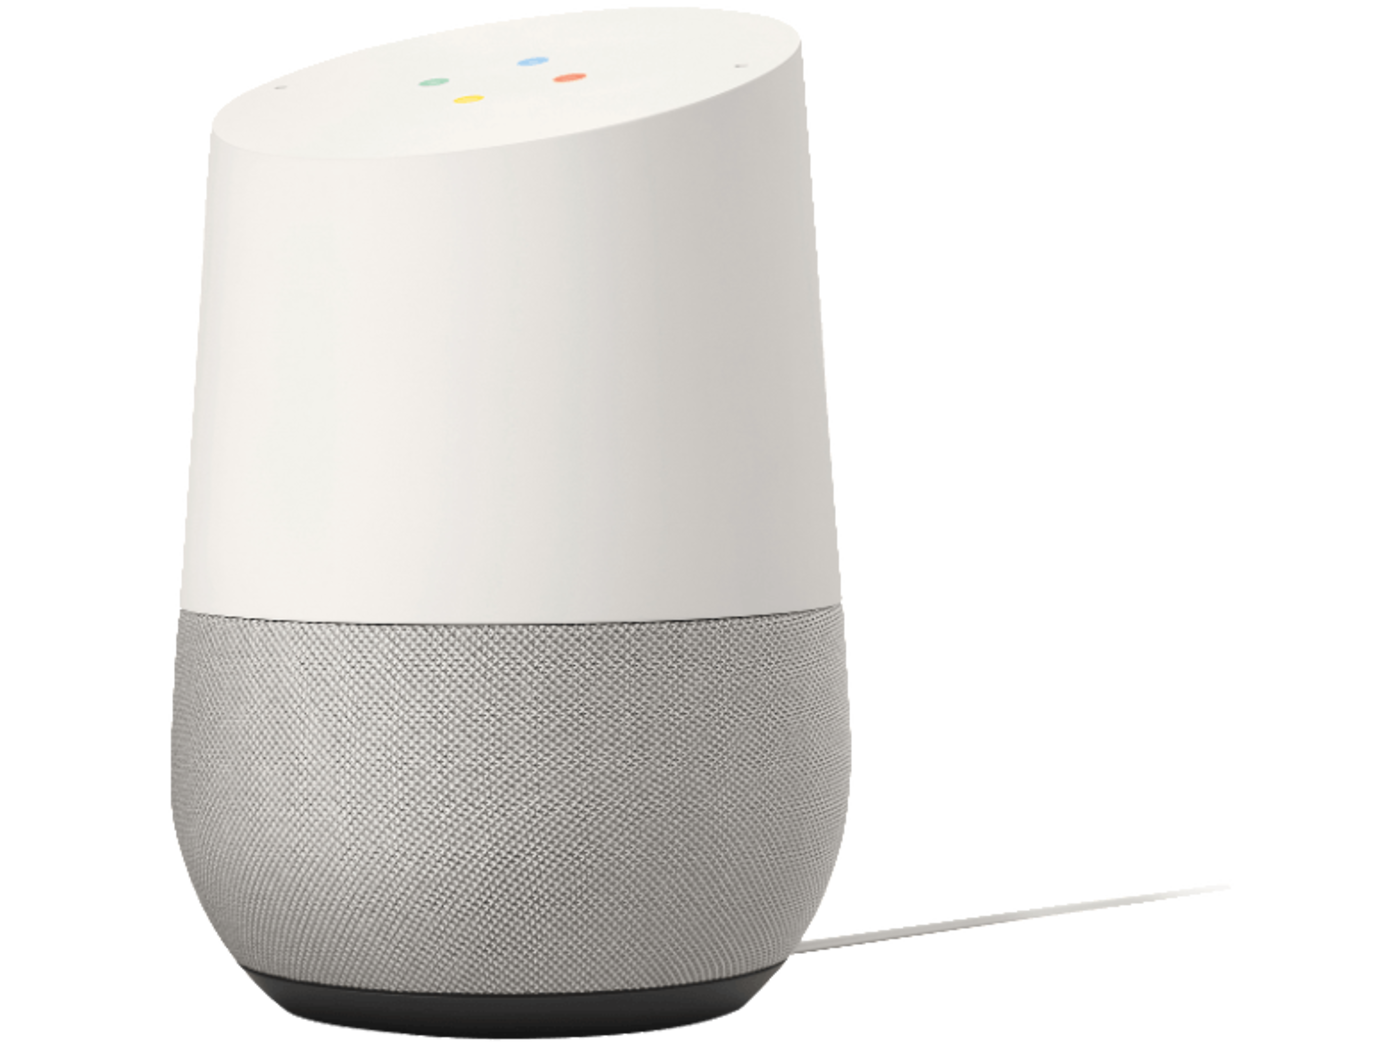 ok google rede mit rock quiz das rock quiz f r google assistant rock antenne. Black Bedroom Furniture Sets. Home Design Ideas